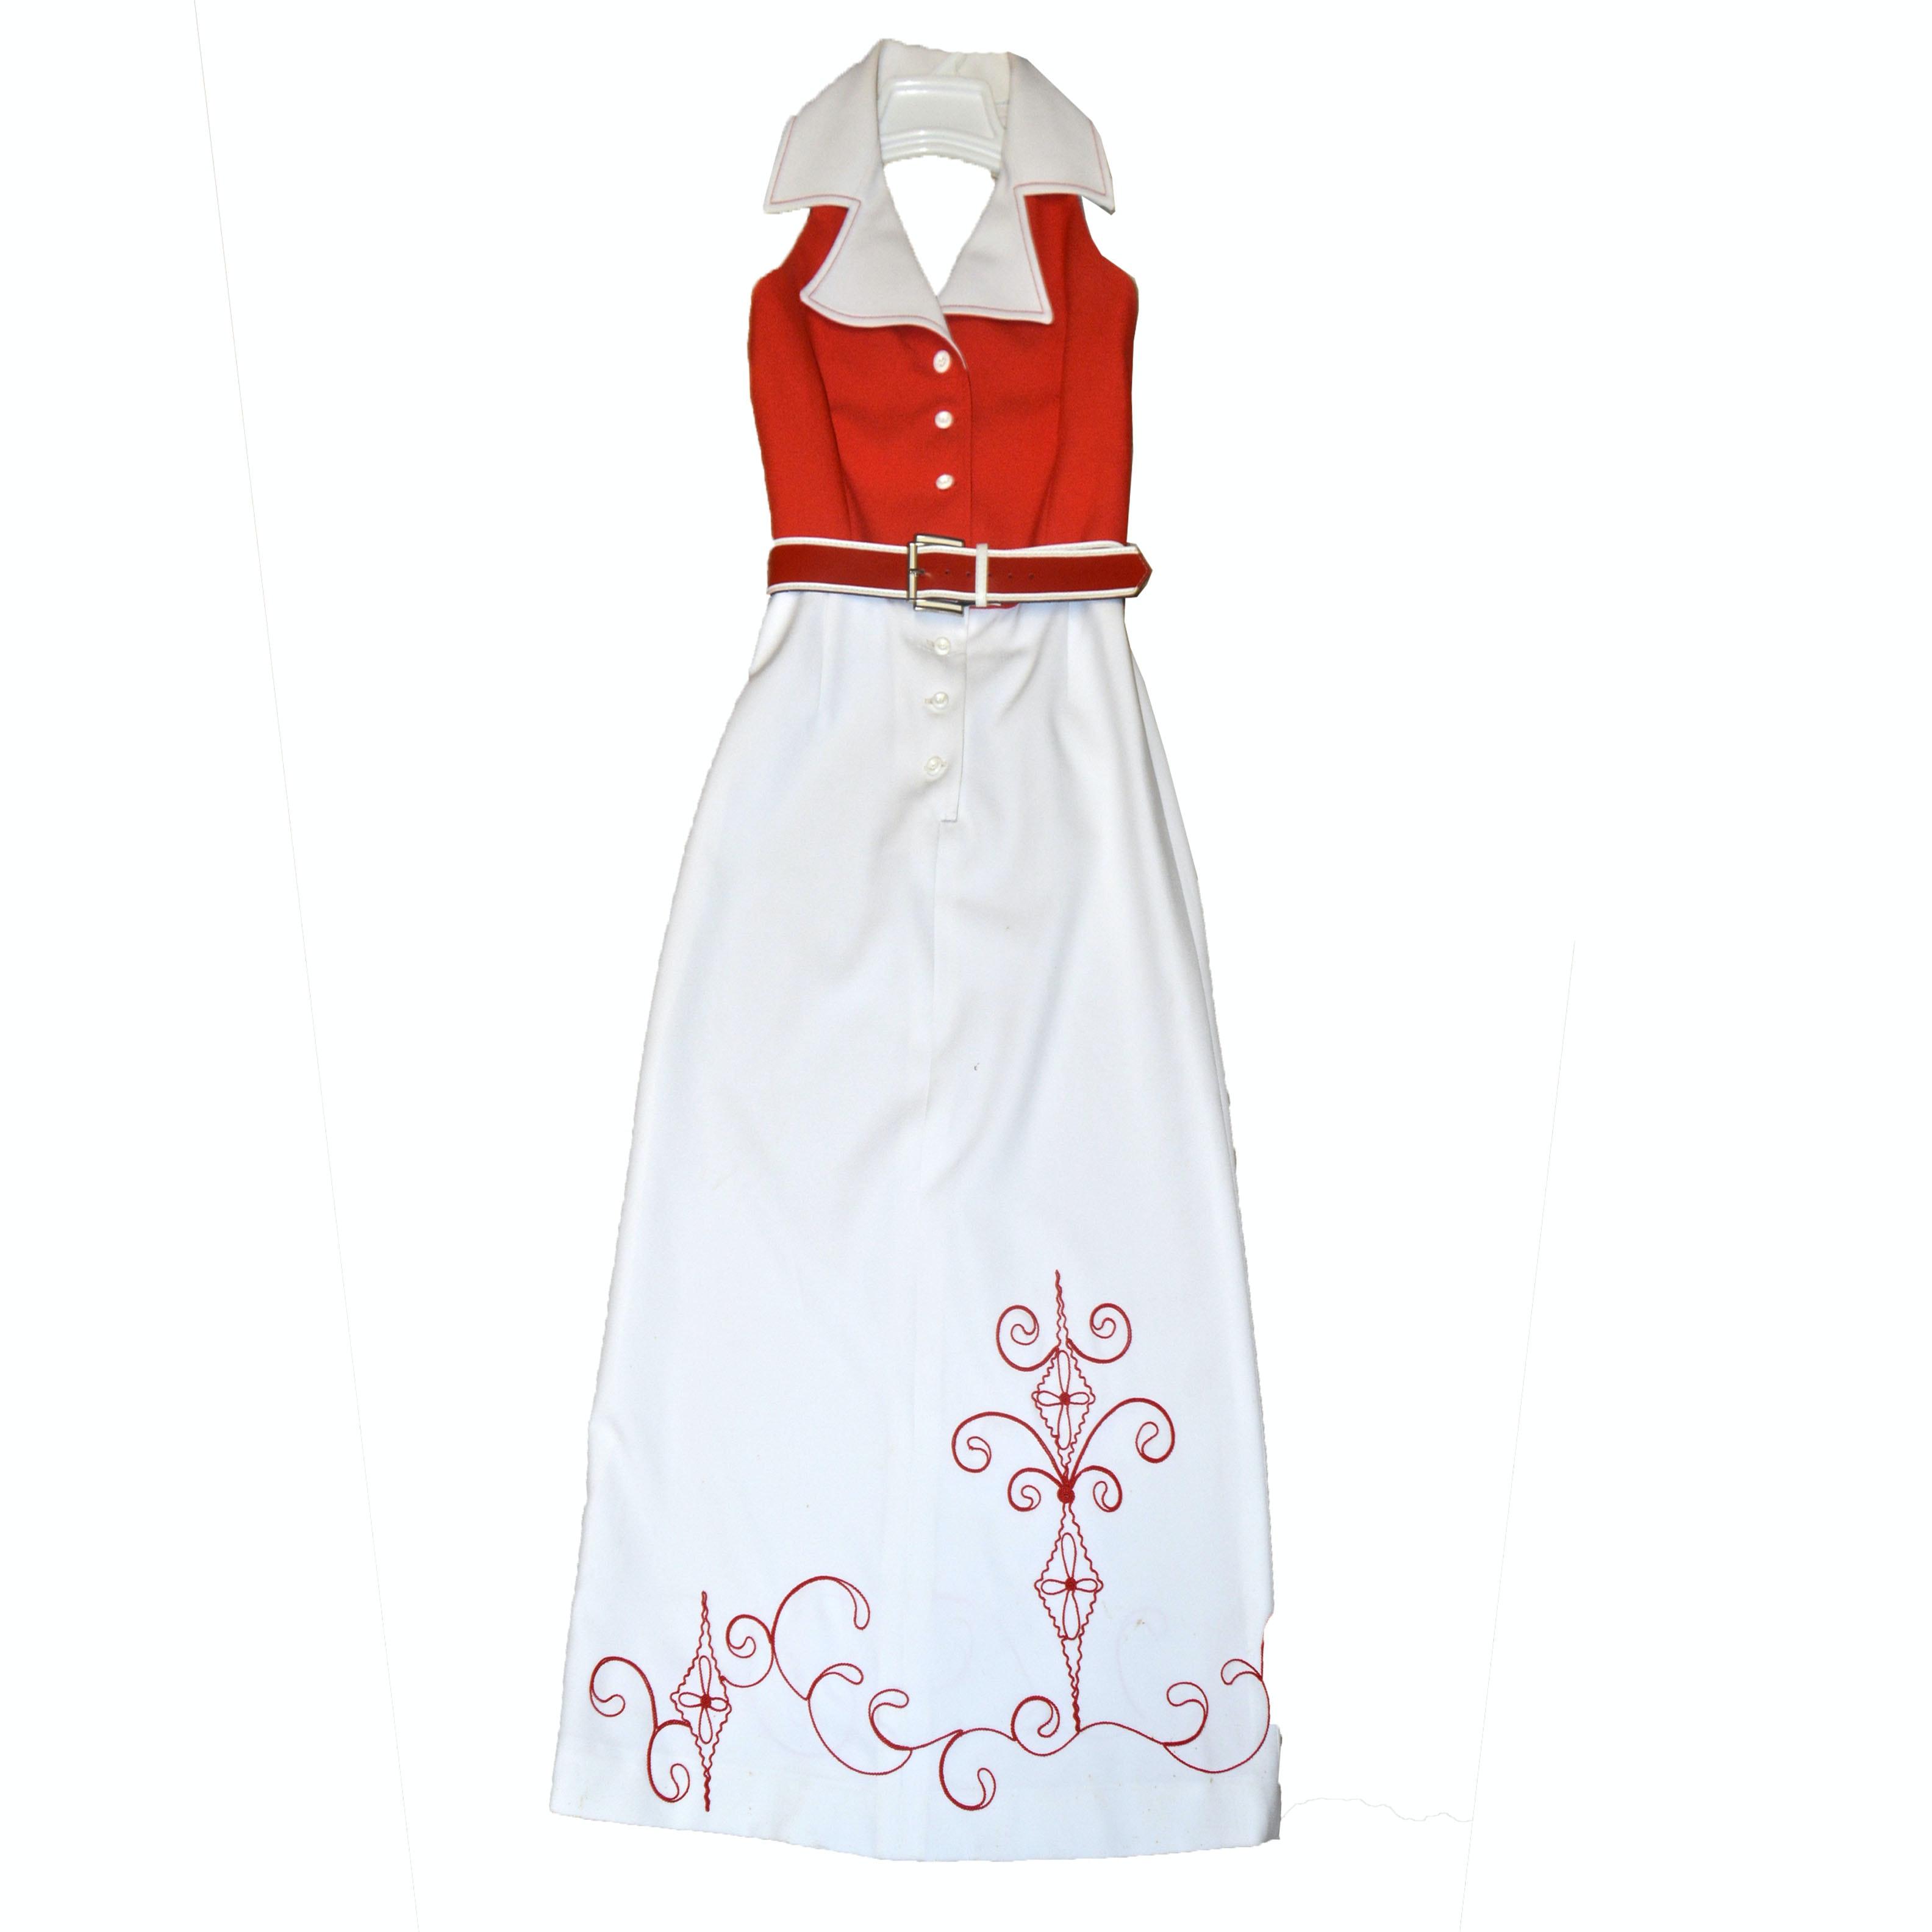 Vintage Halter Dress with ILGWU Clothing Label